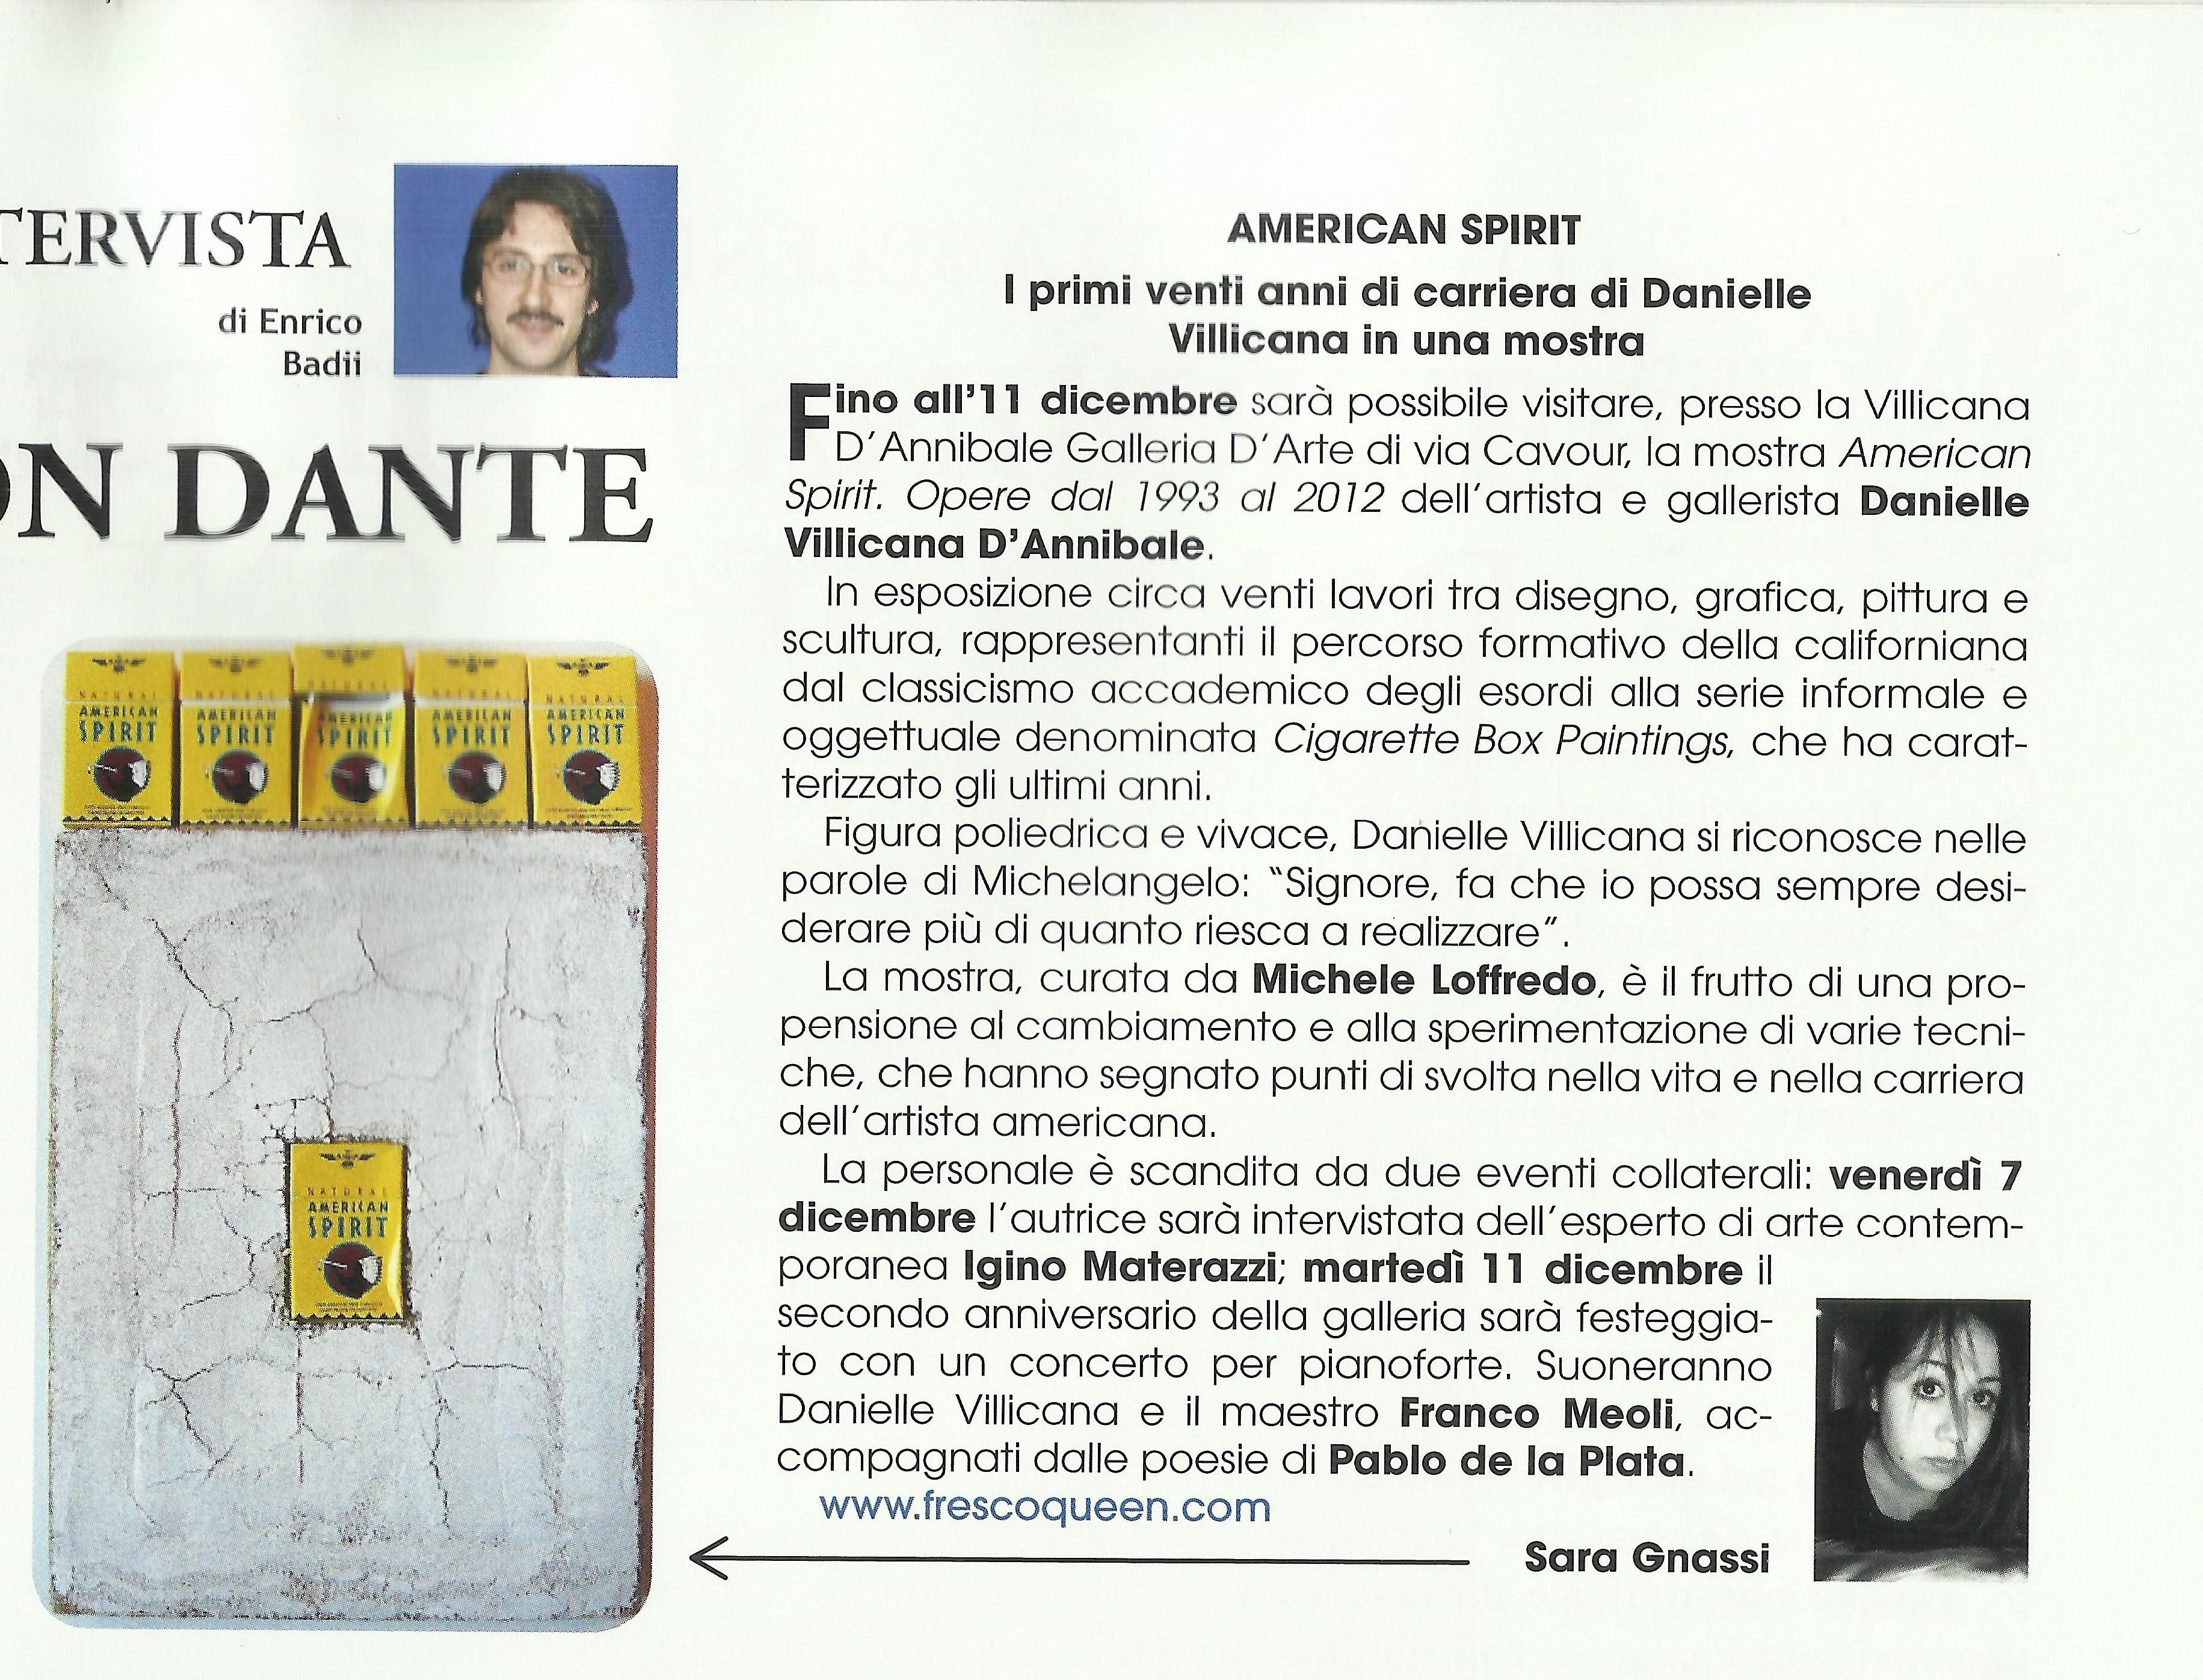 Danielle Villicana D'Annibale